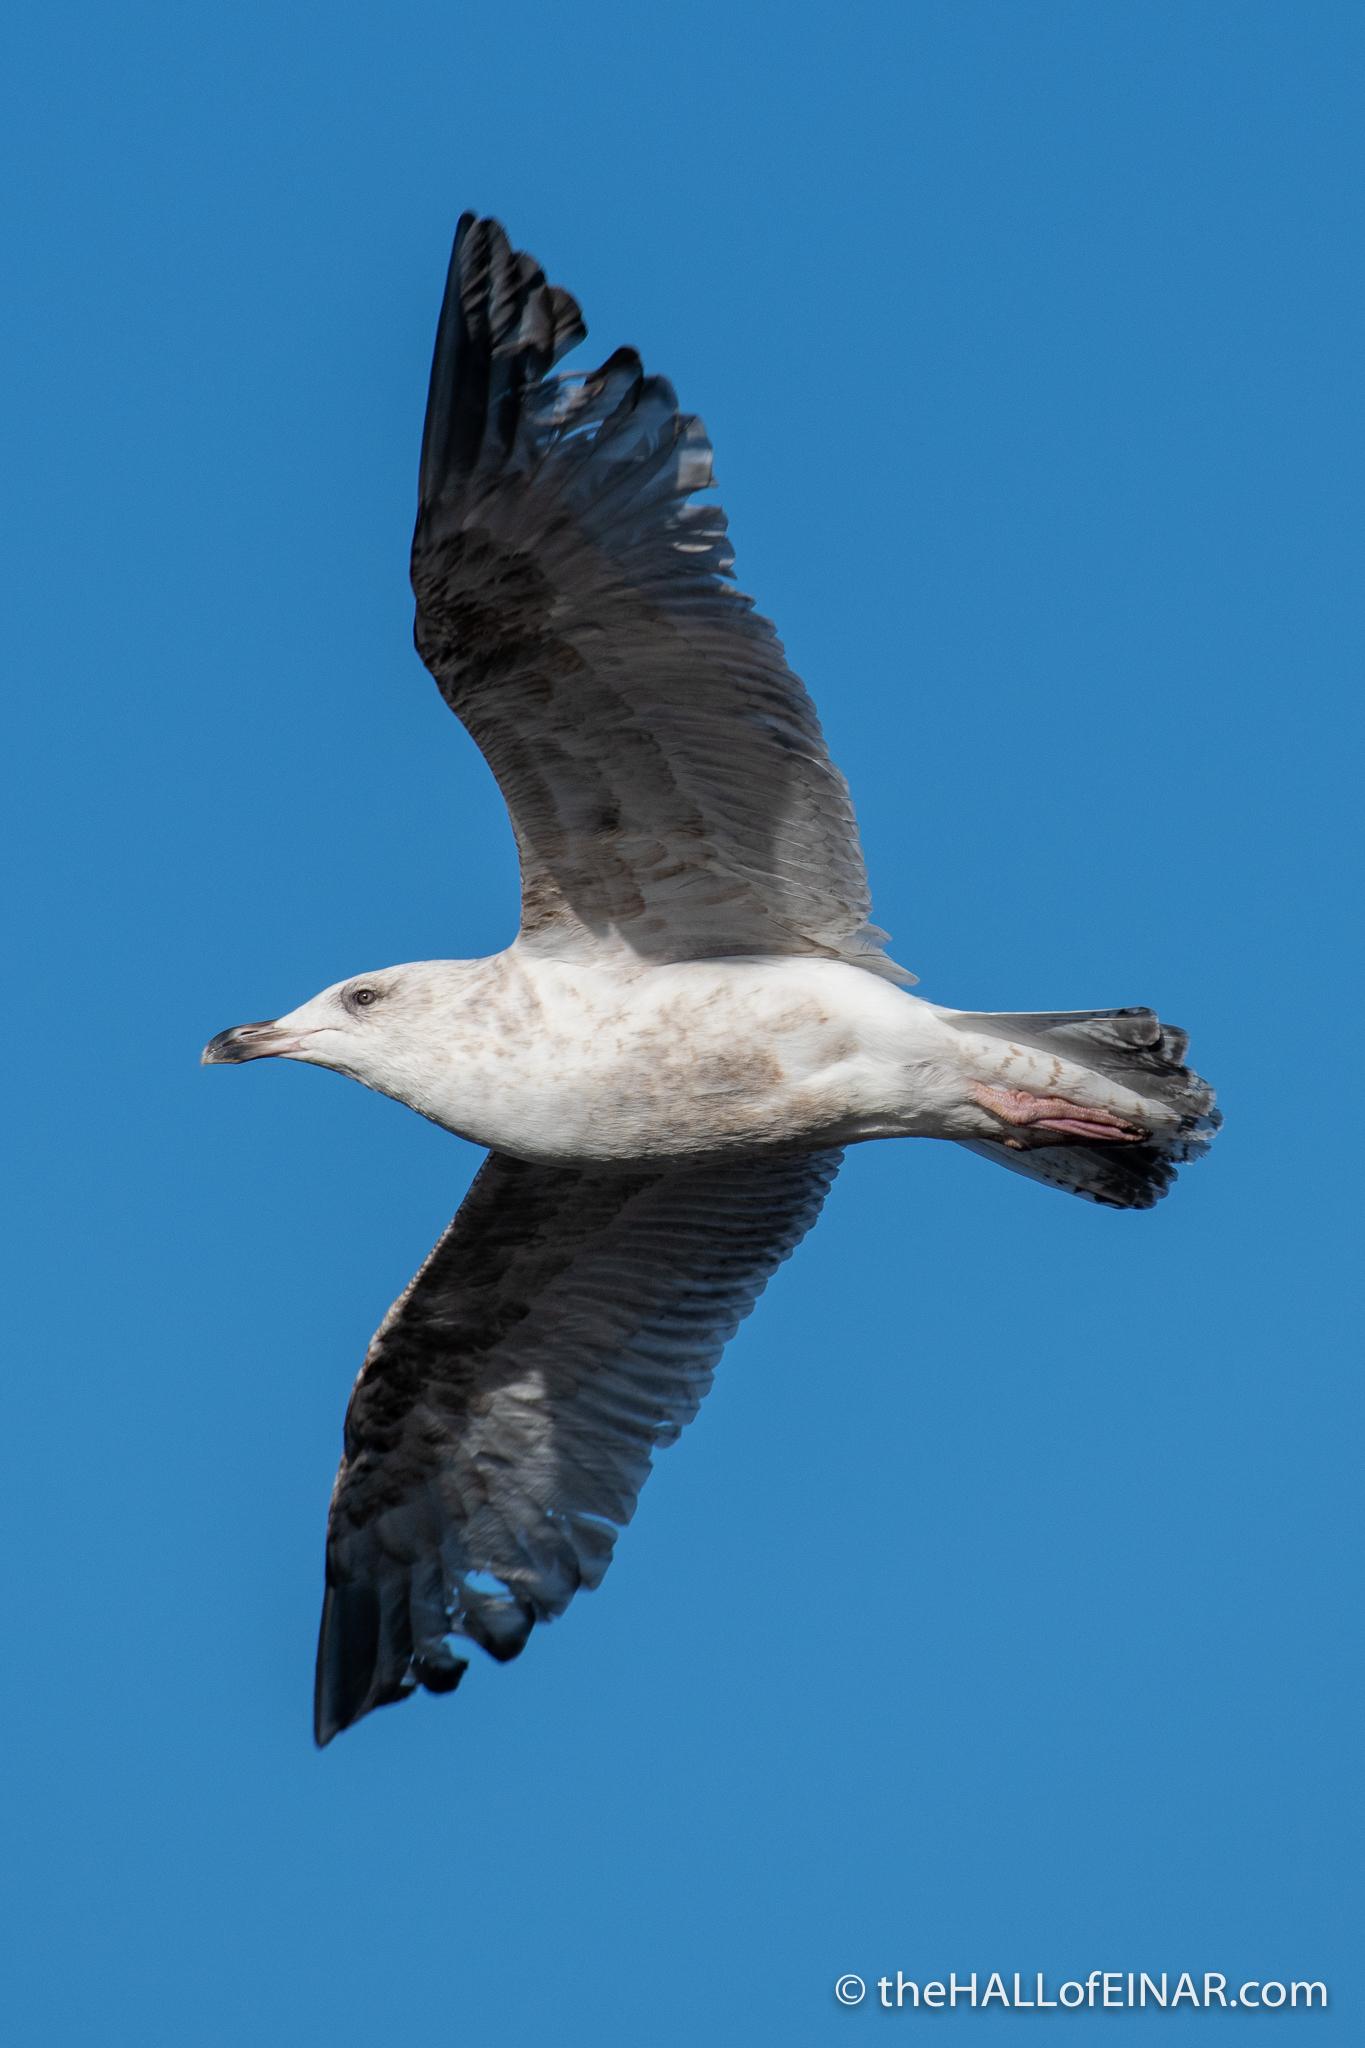 Herring Gull - Lodmoor - The Hall of Einar - photograph (c) David Bailey (not the)